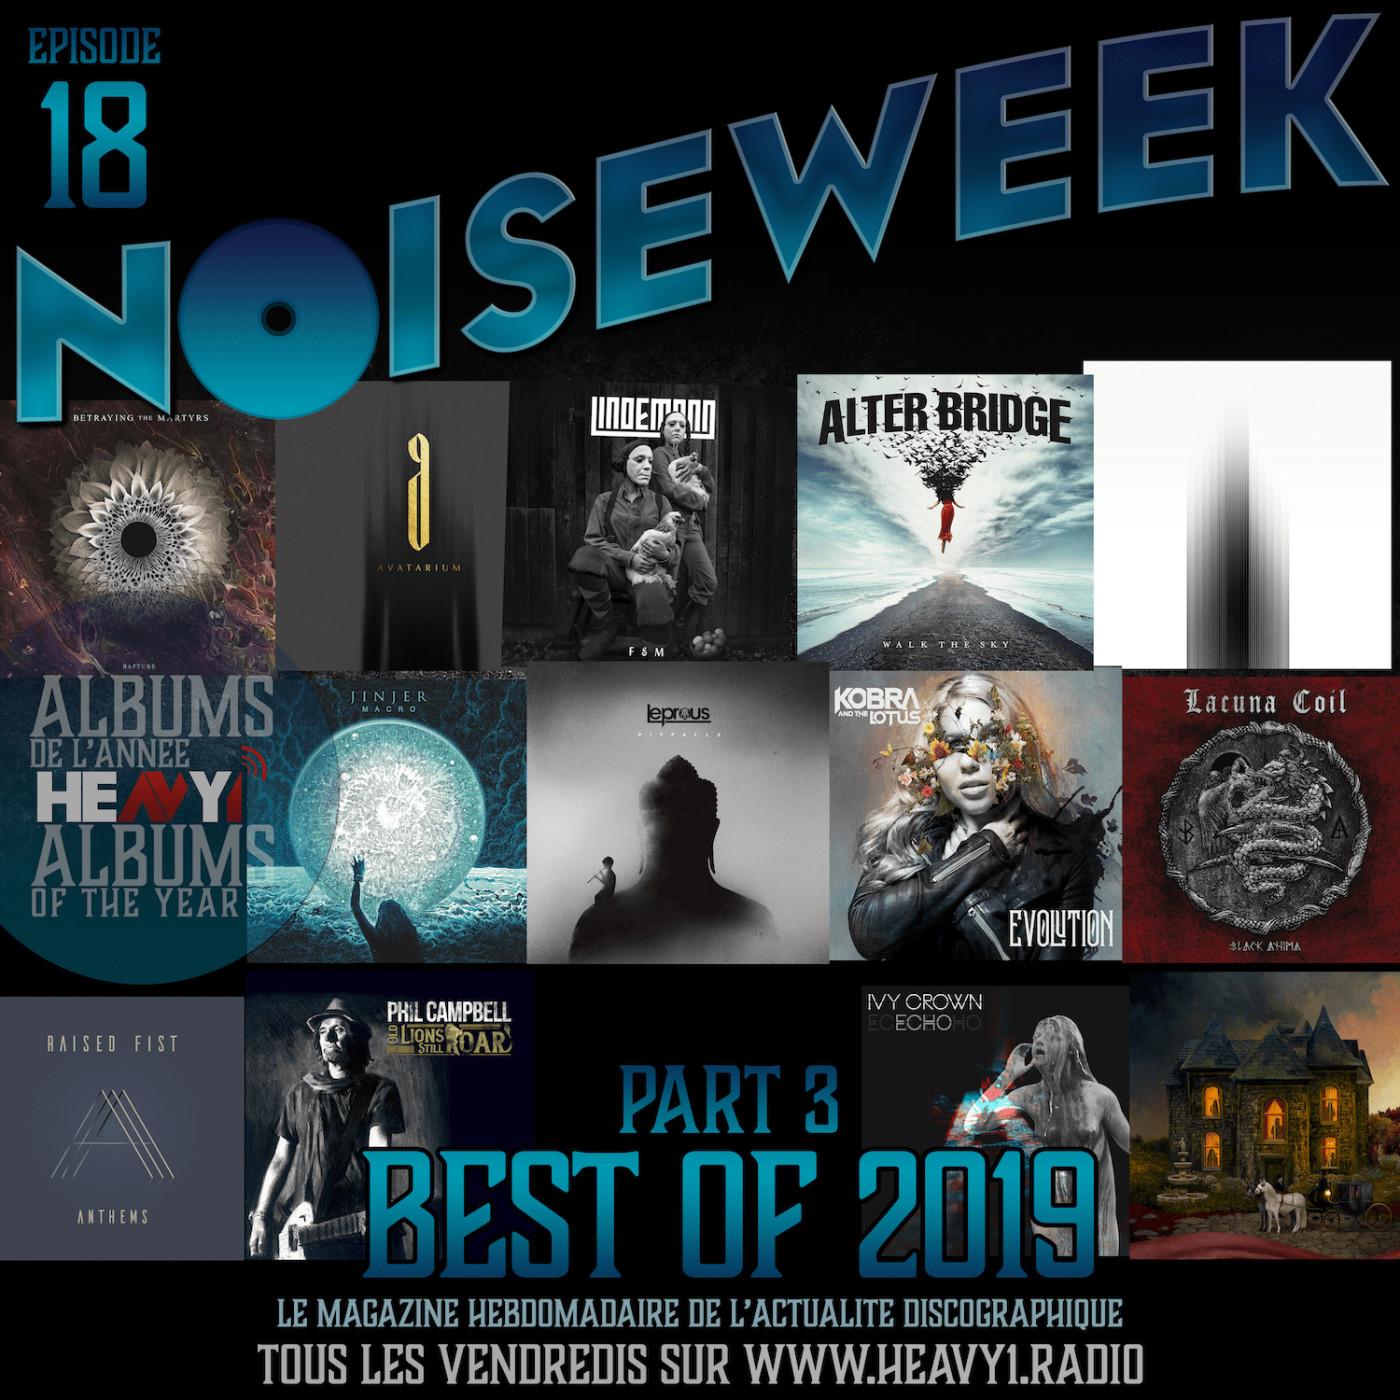 Noiseweek #18 Saison 3